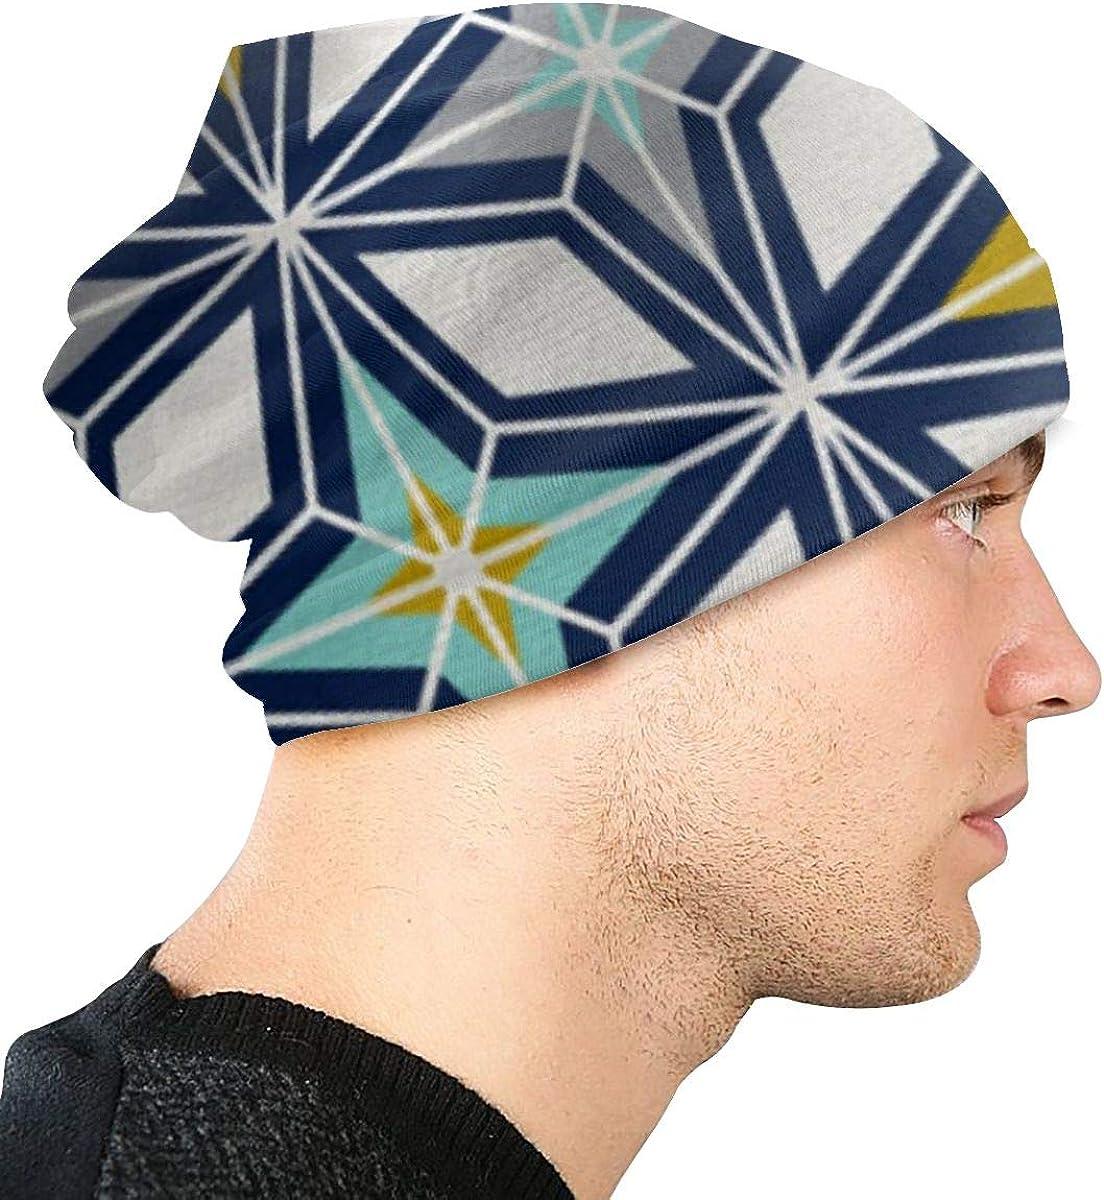 Unisex Navy /& Gold Midcentury Modern Geometric Running Beanie Cap Cuffed Plain Skull Cap Hat